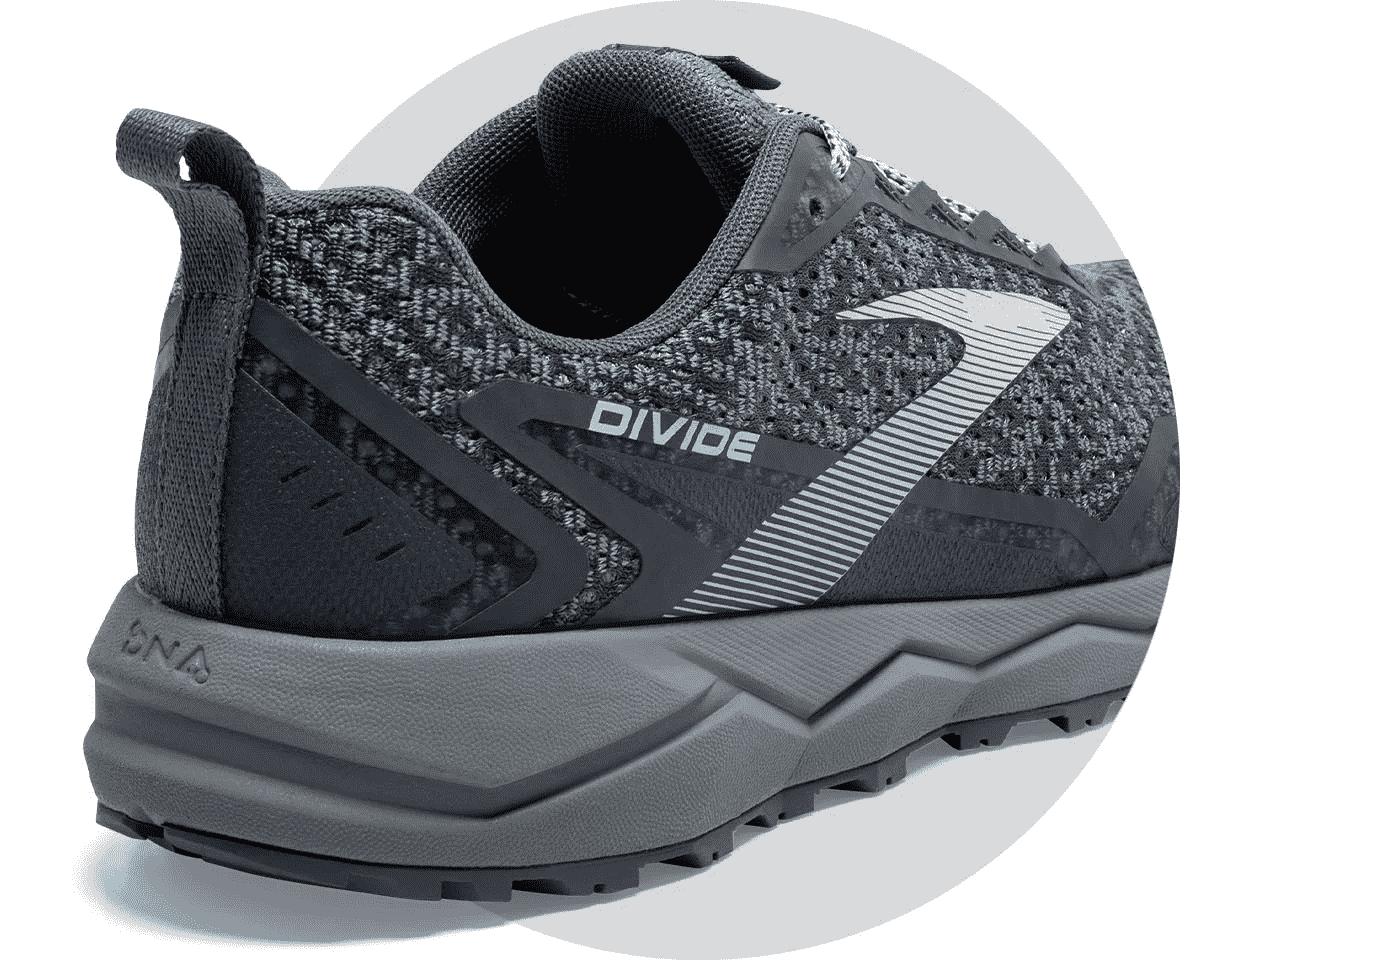 Brooks-Divide-trail-chaussure-running-runpack-femme-6